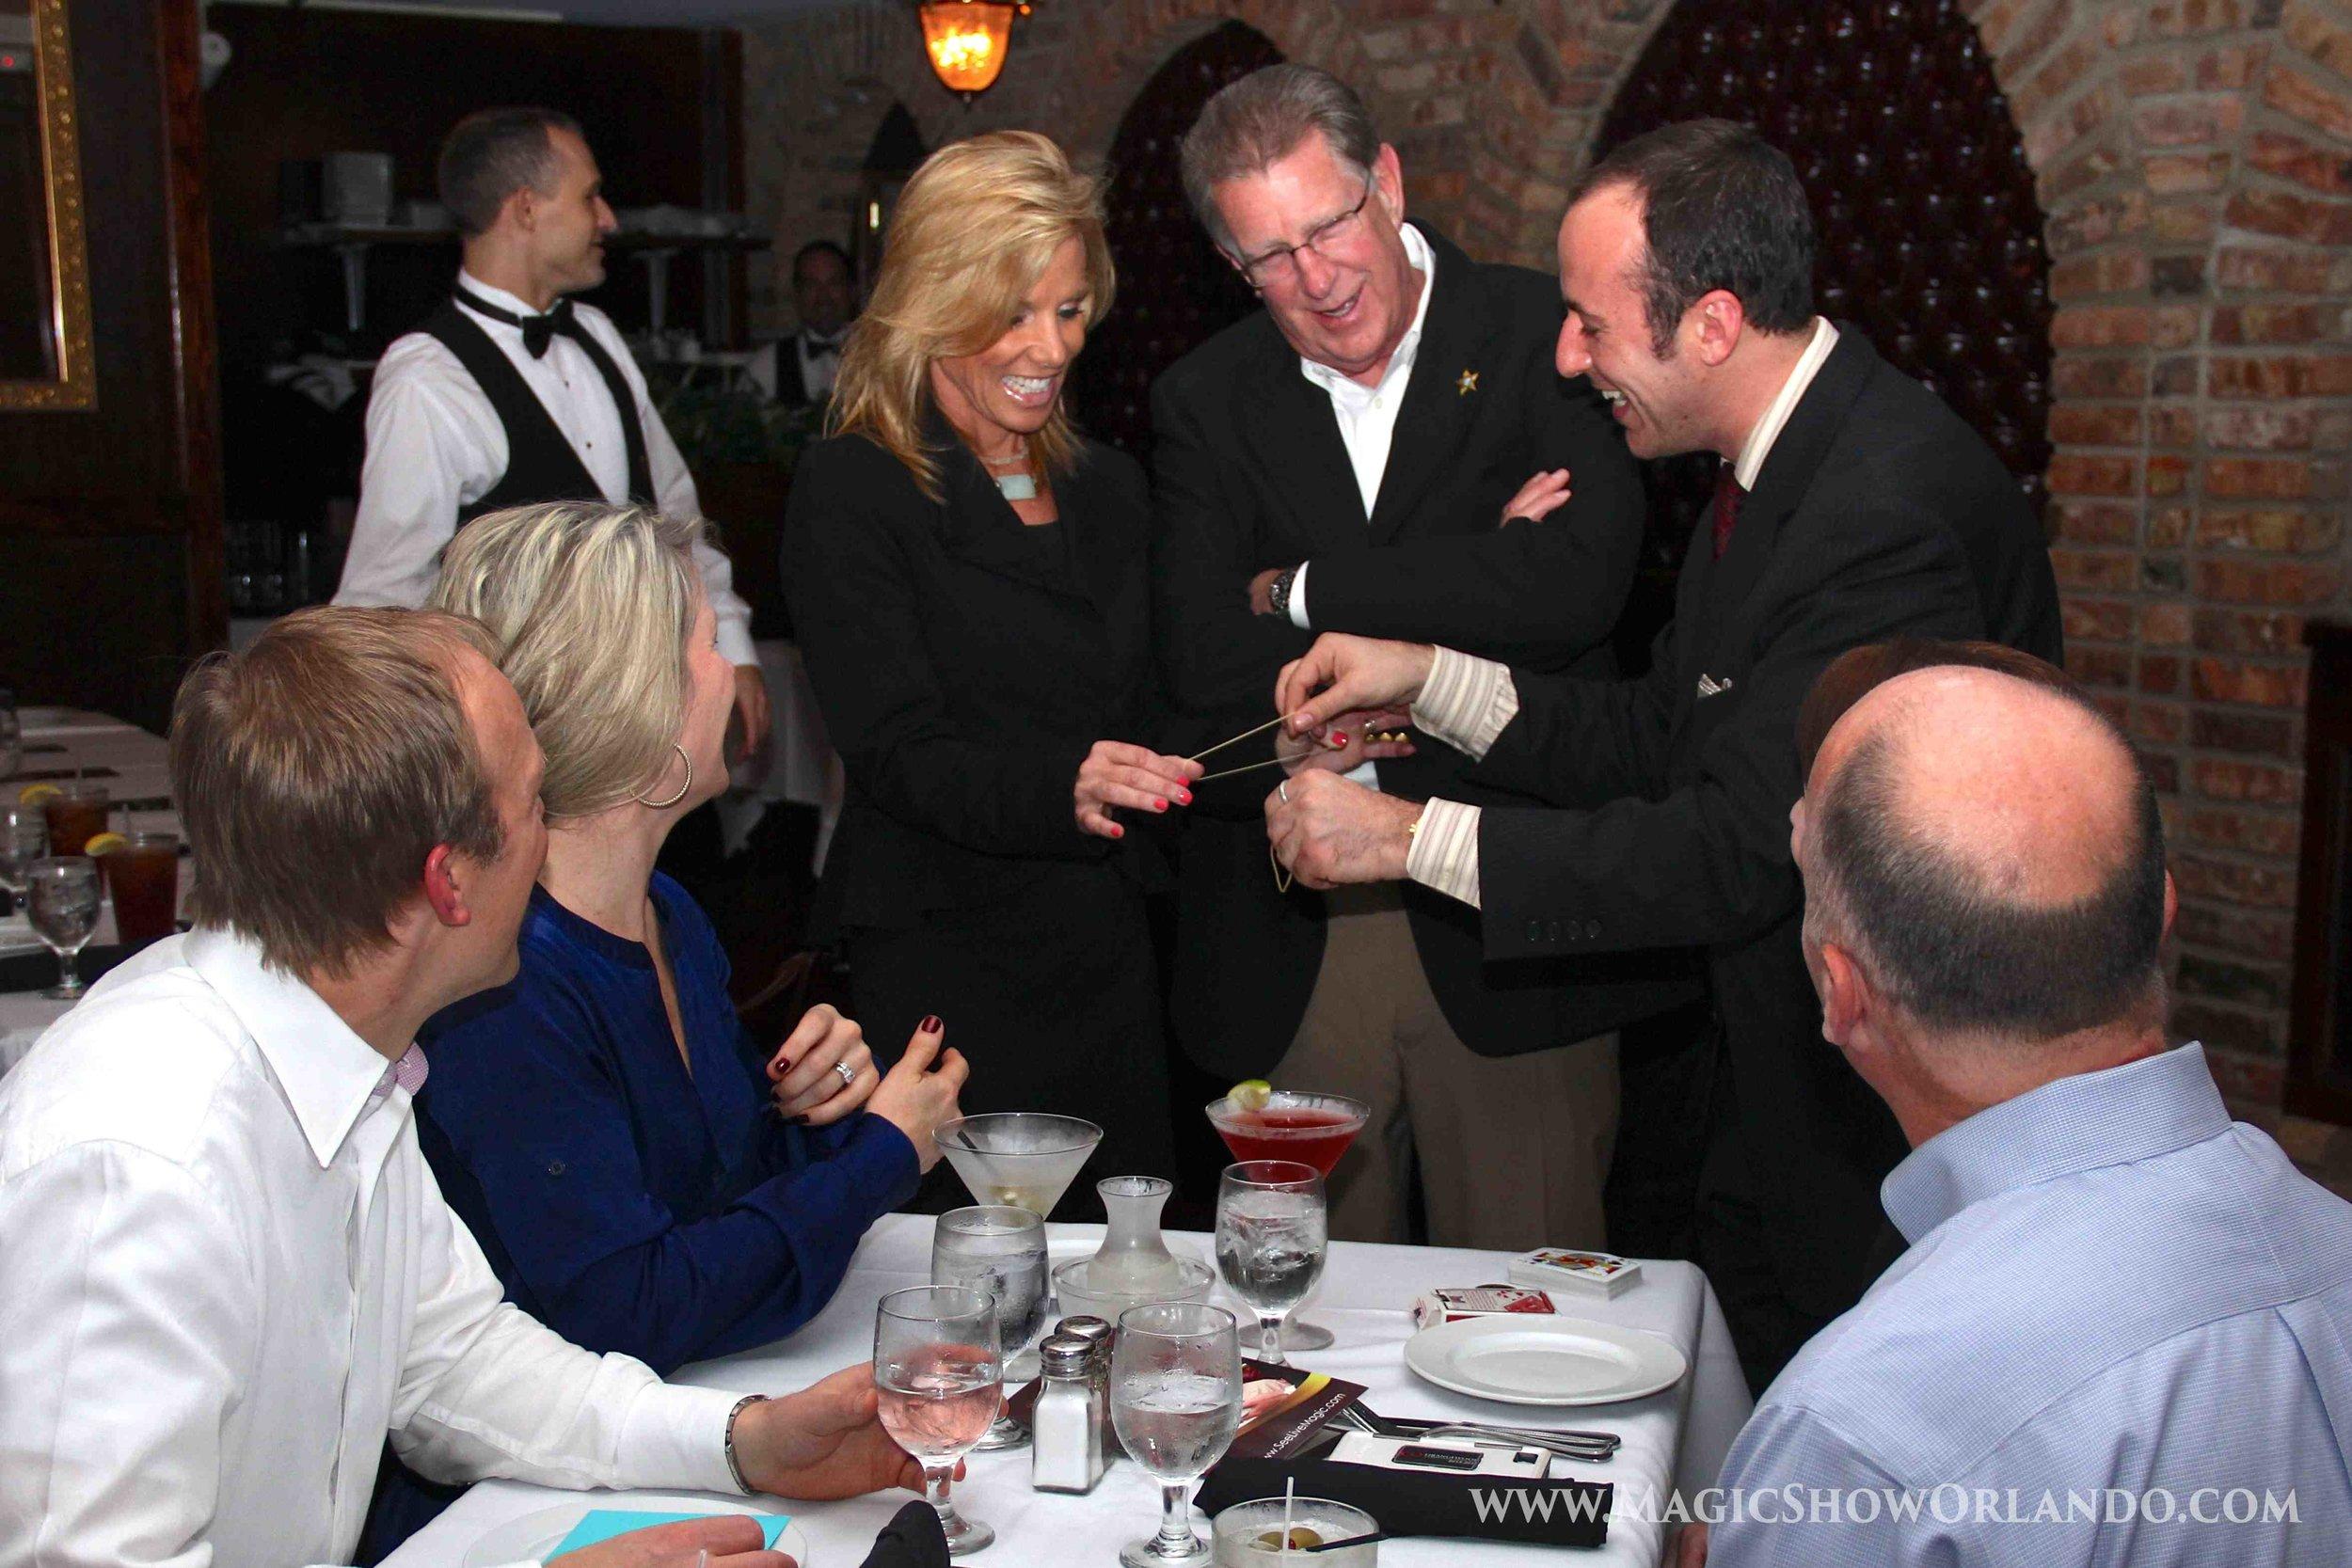 Orlando magician Kostya Kimlat provides entertainments at rehearsal dinners